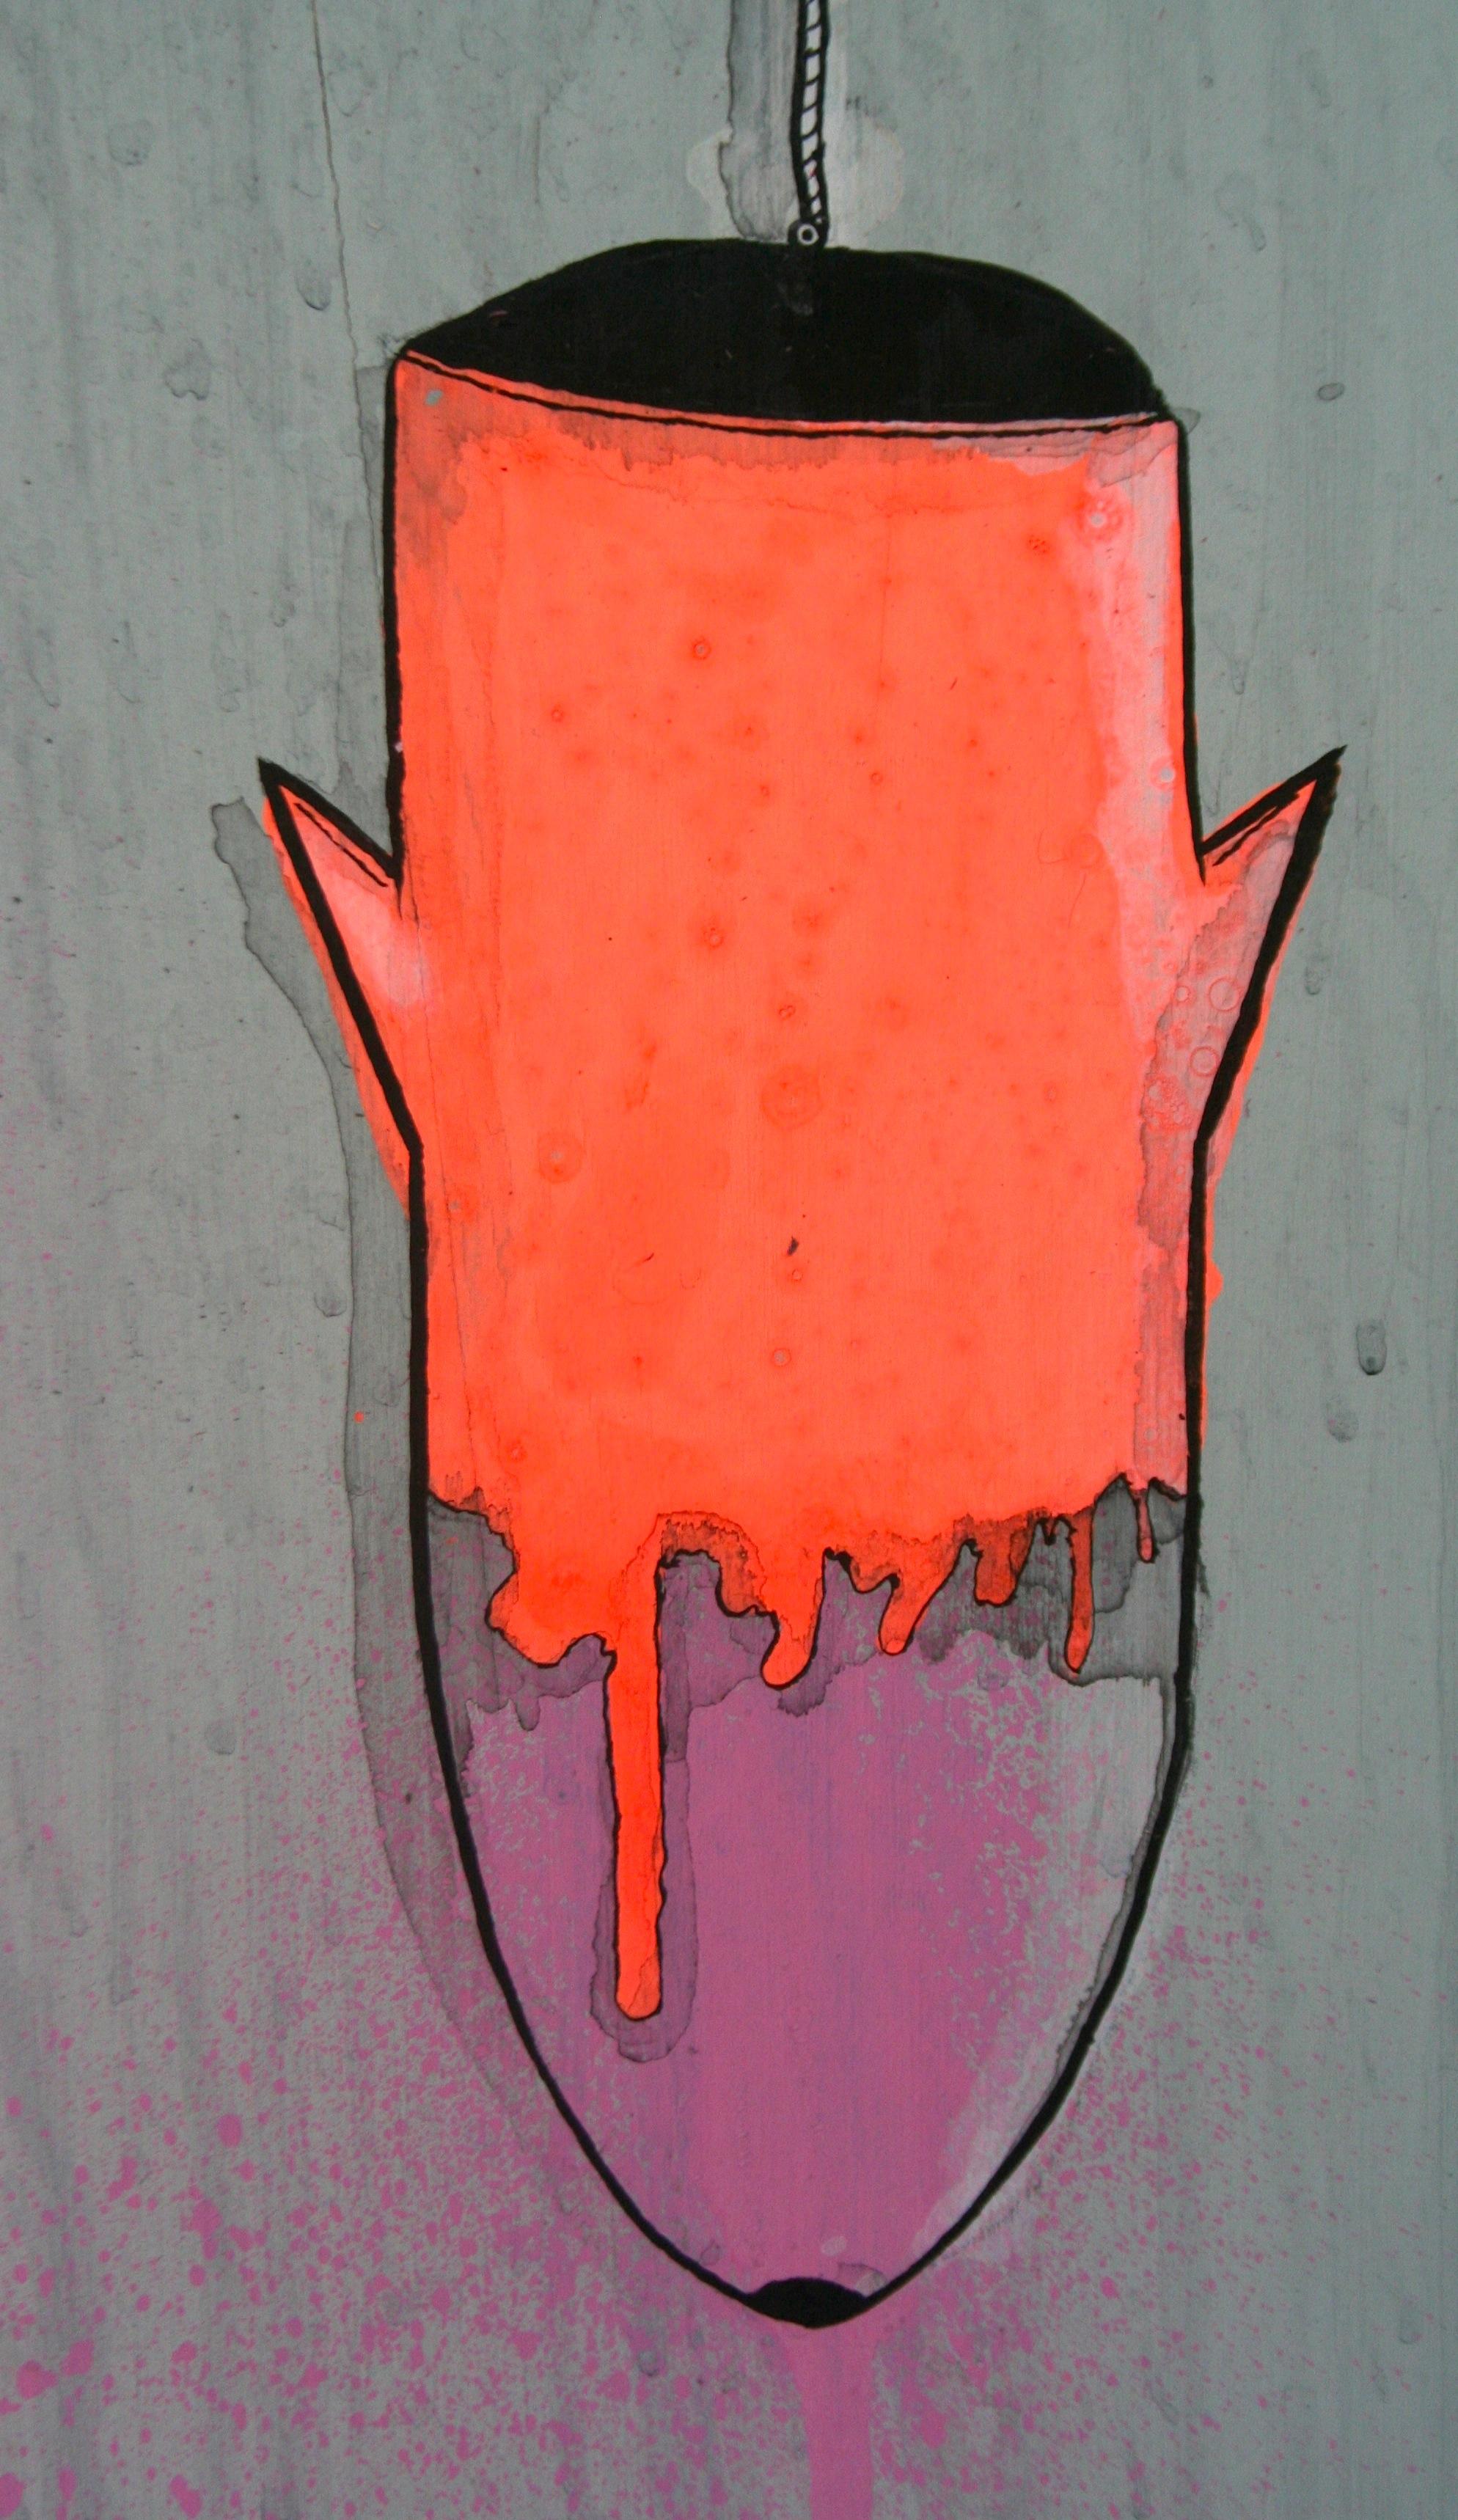 Bomb art